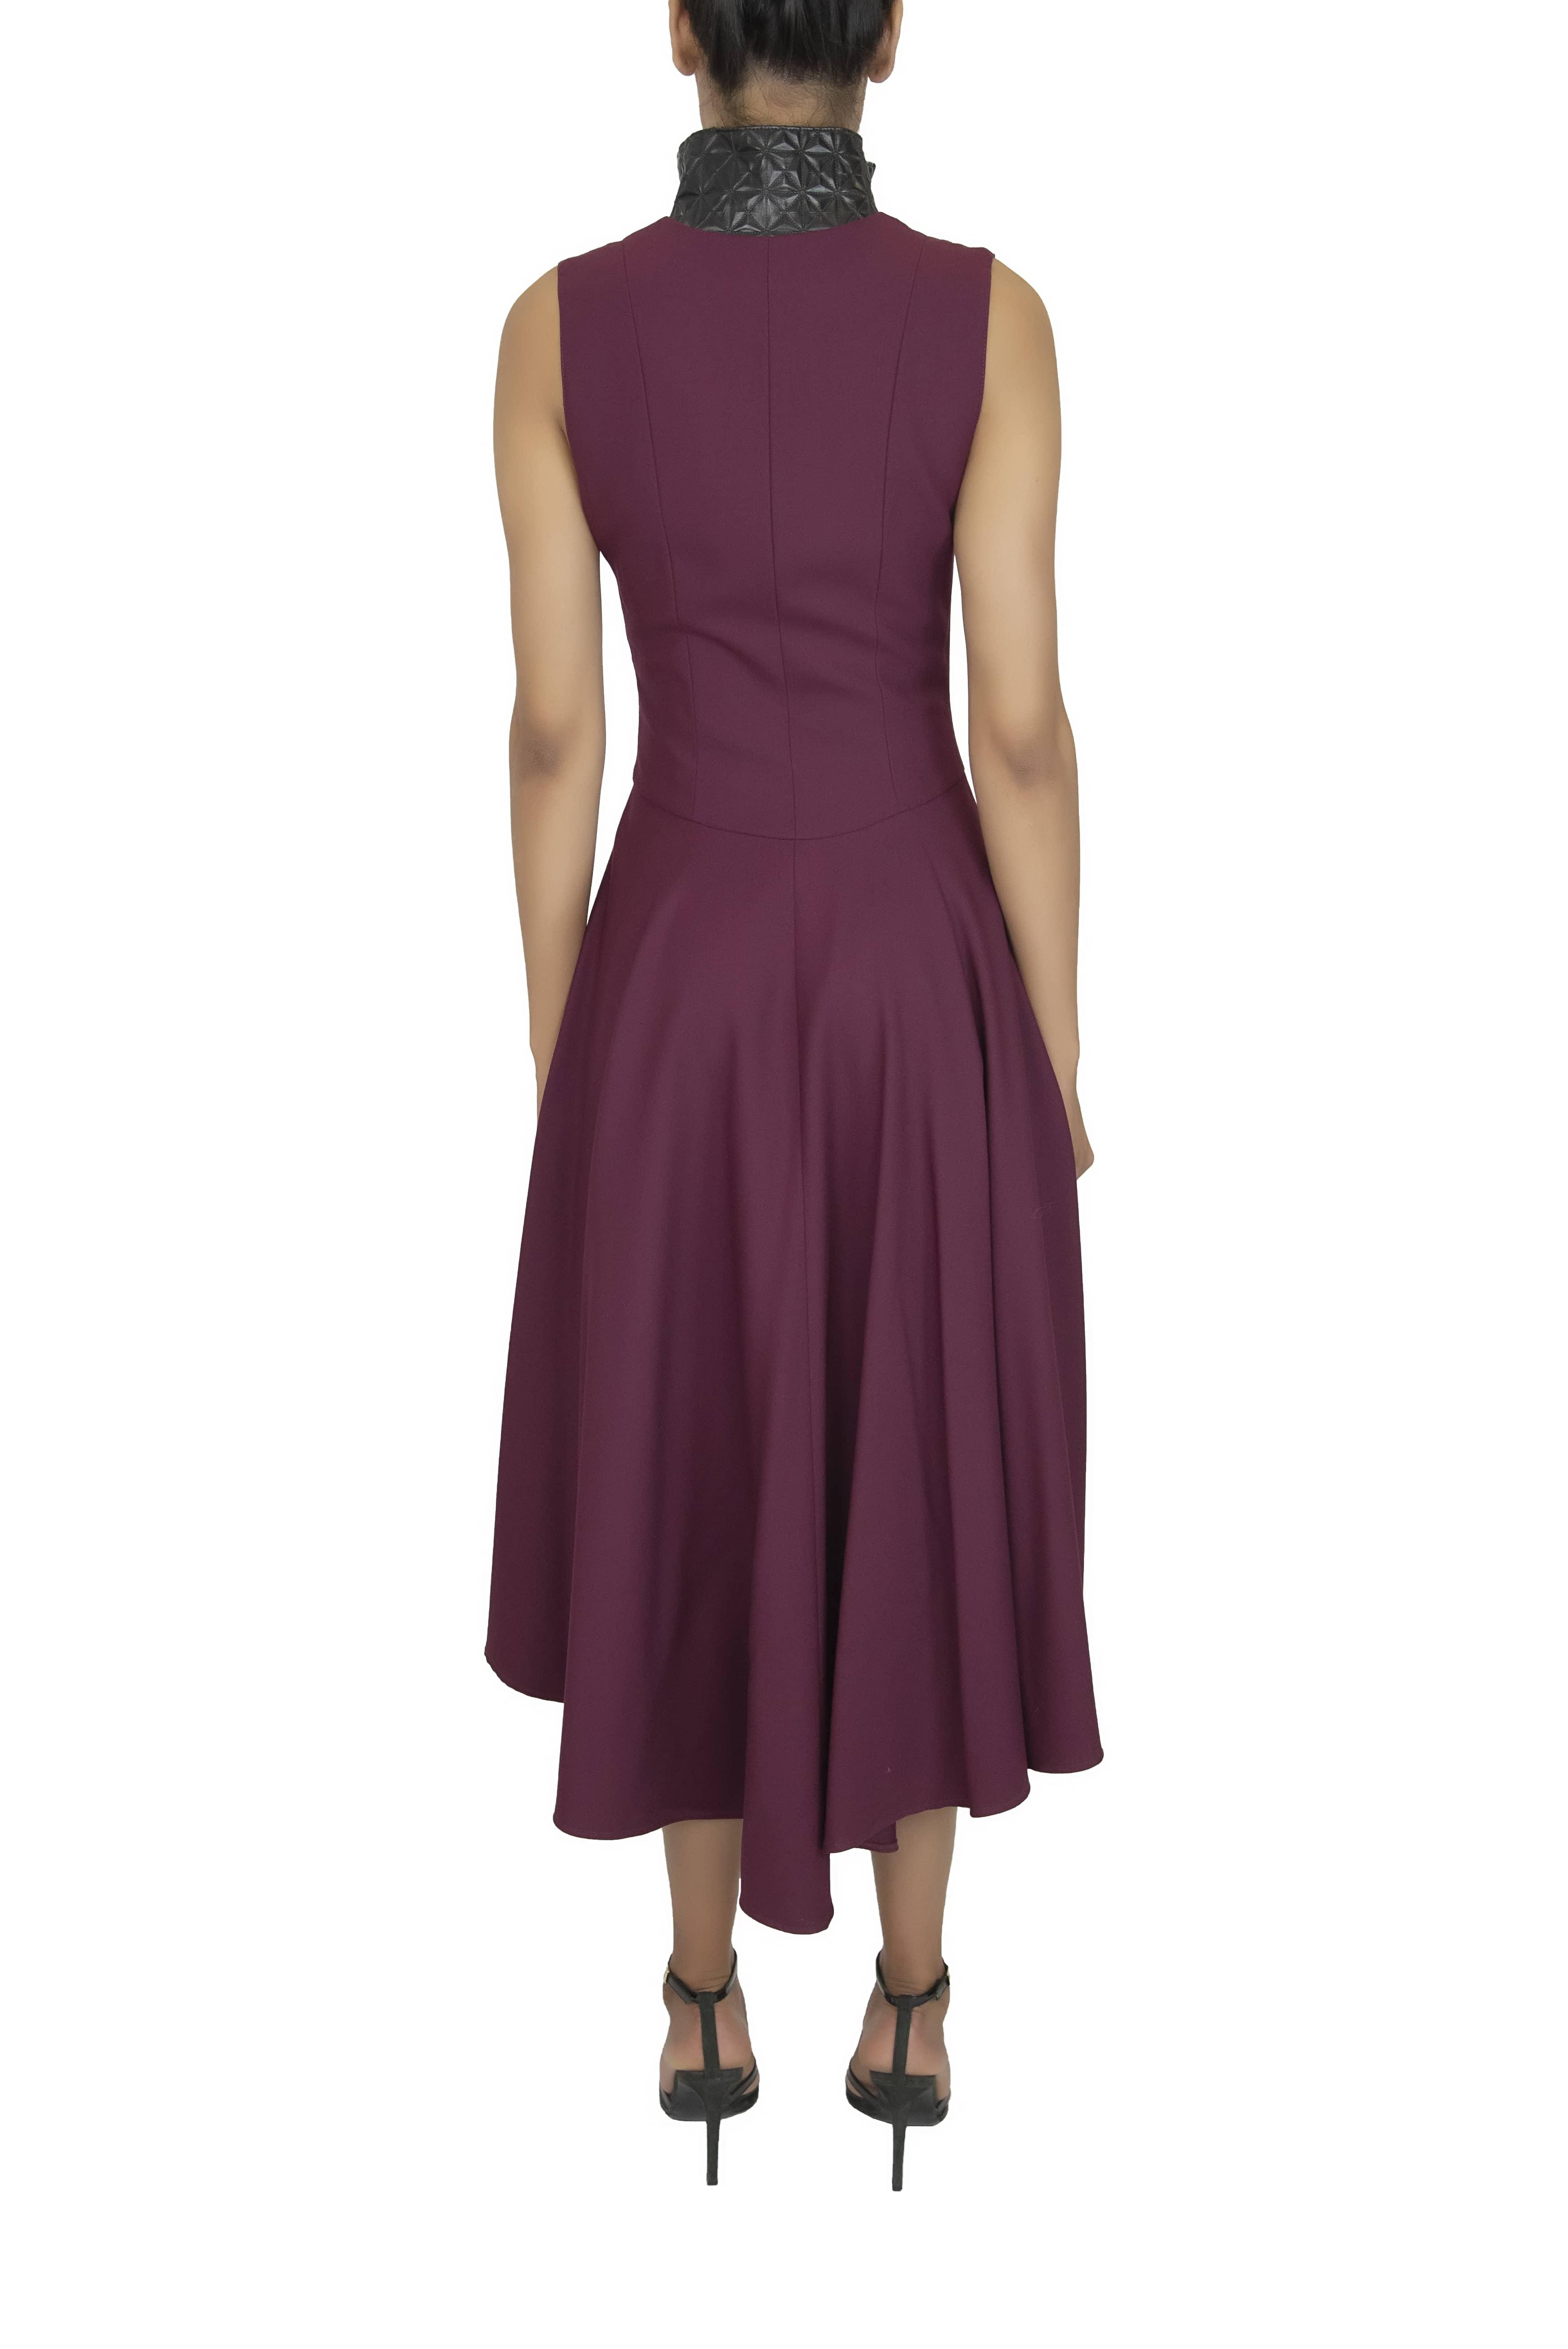 Dress DALIM 2